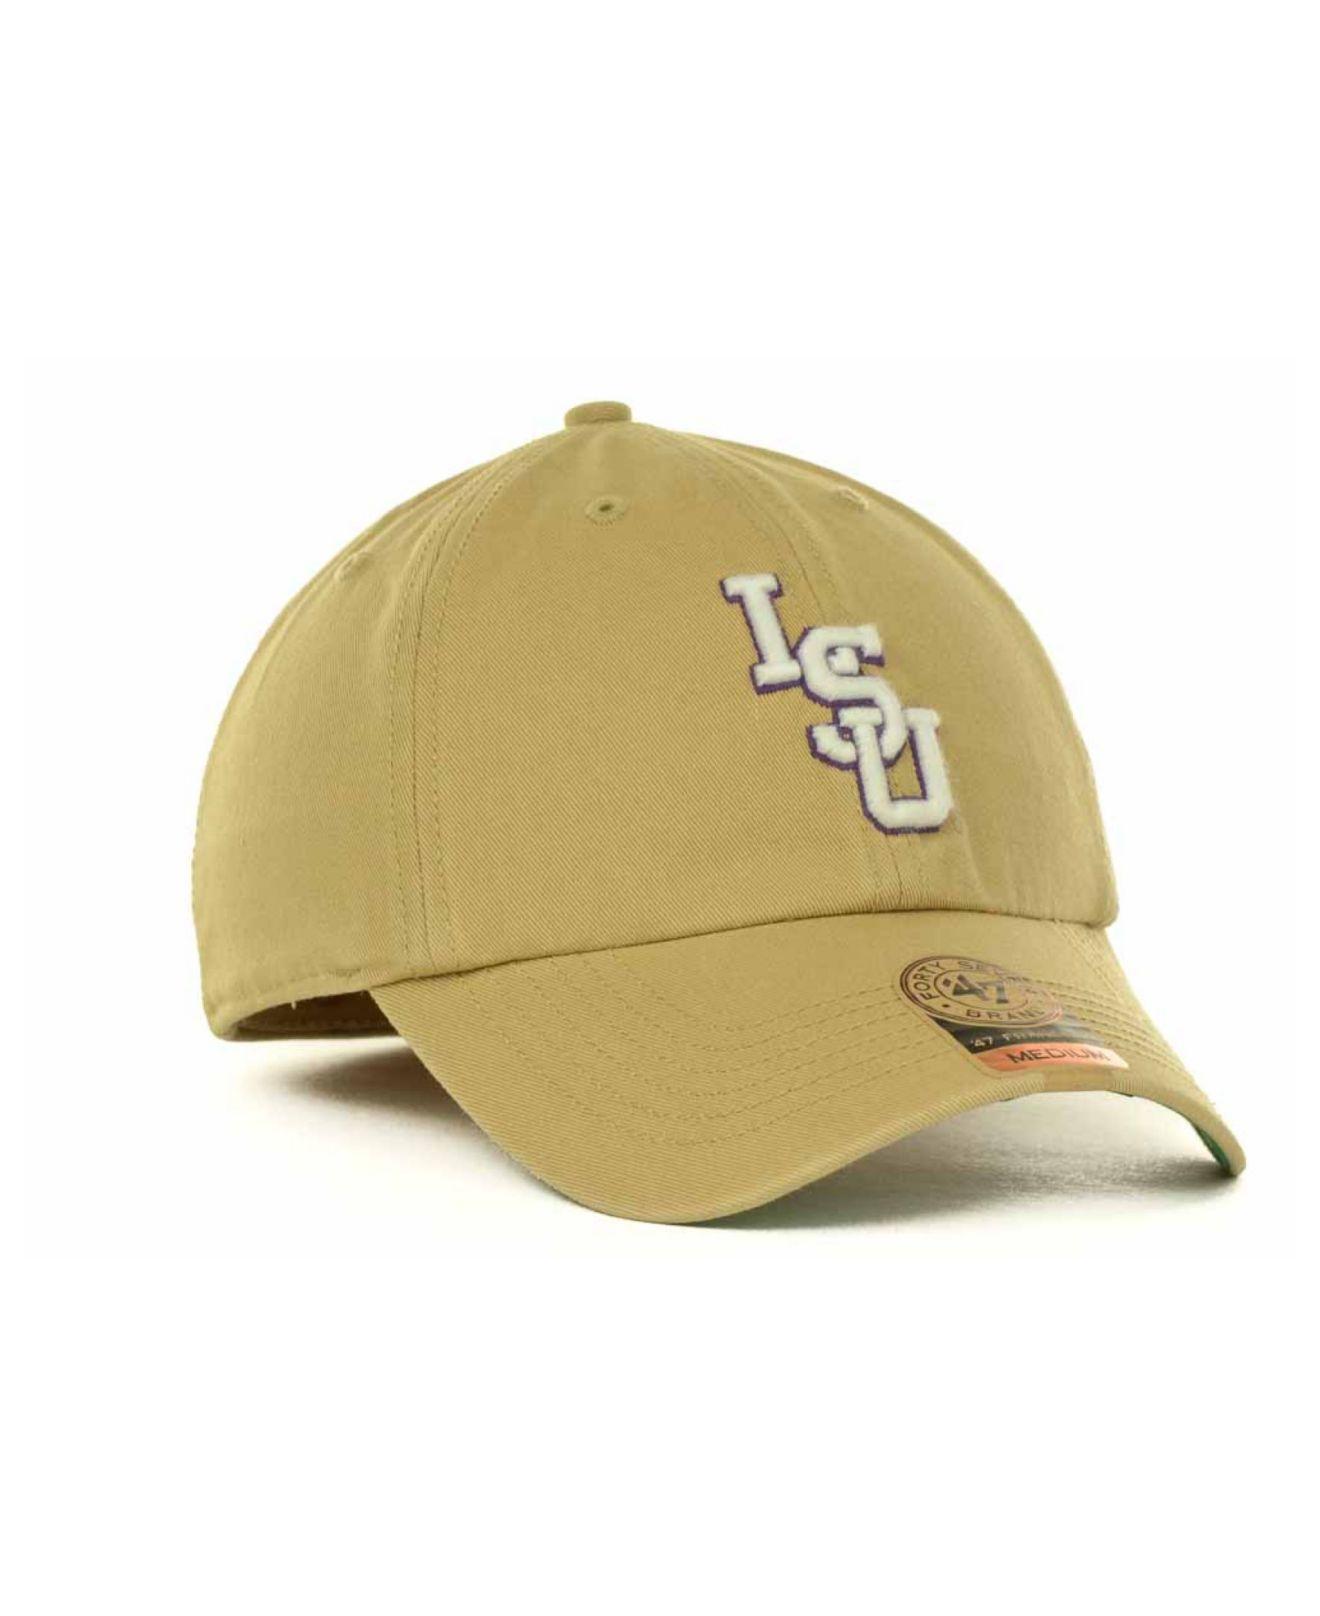 8cd5b17415d47 ... clearance lyst 47 brand lsu tigers khaki franchise cap in natural for  men b2676 43621